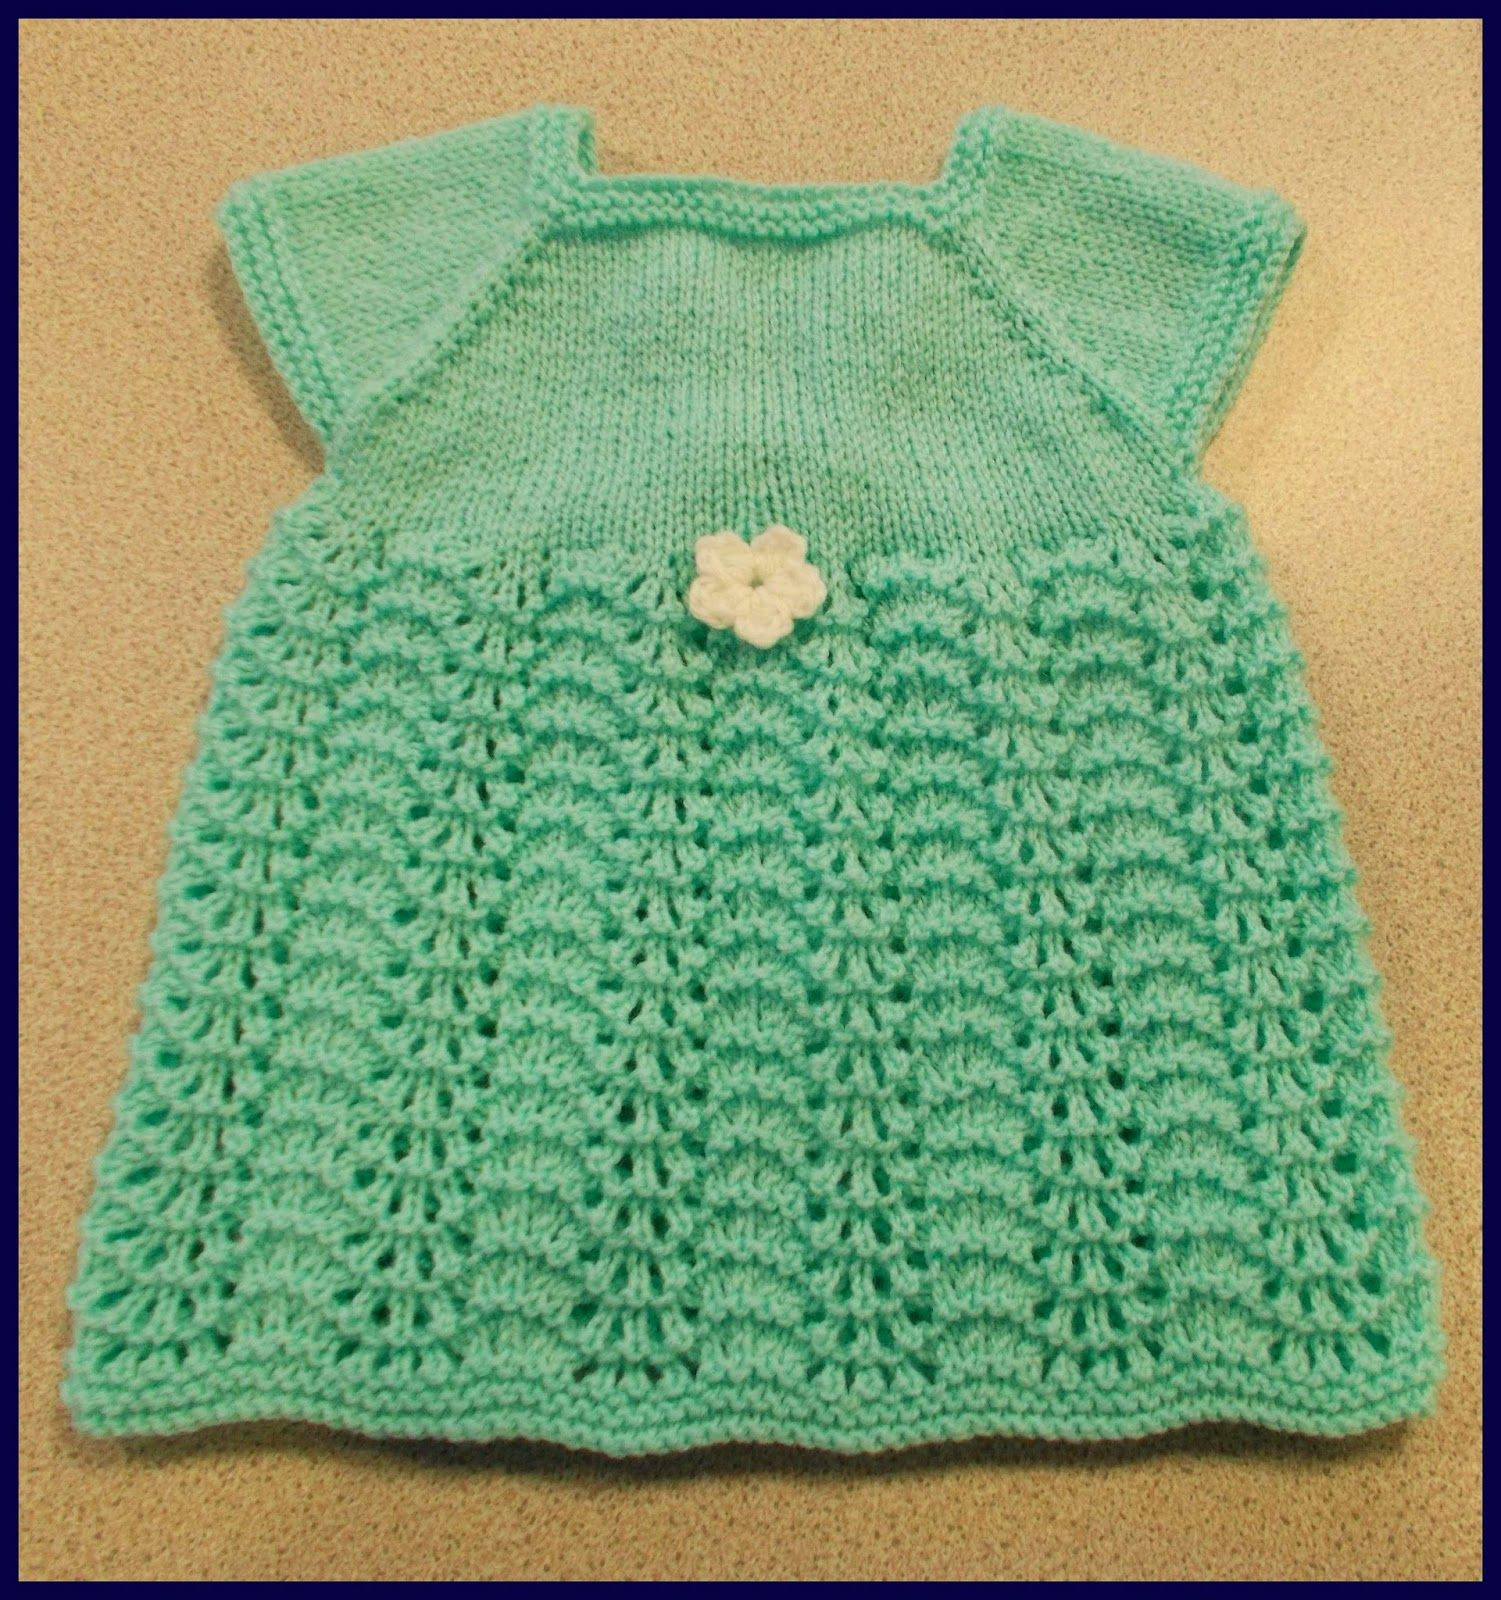 marianna's lazy daisy days: Meadow Sweet Baby Dress free 4,0